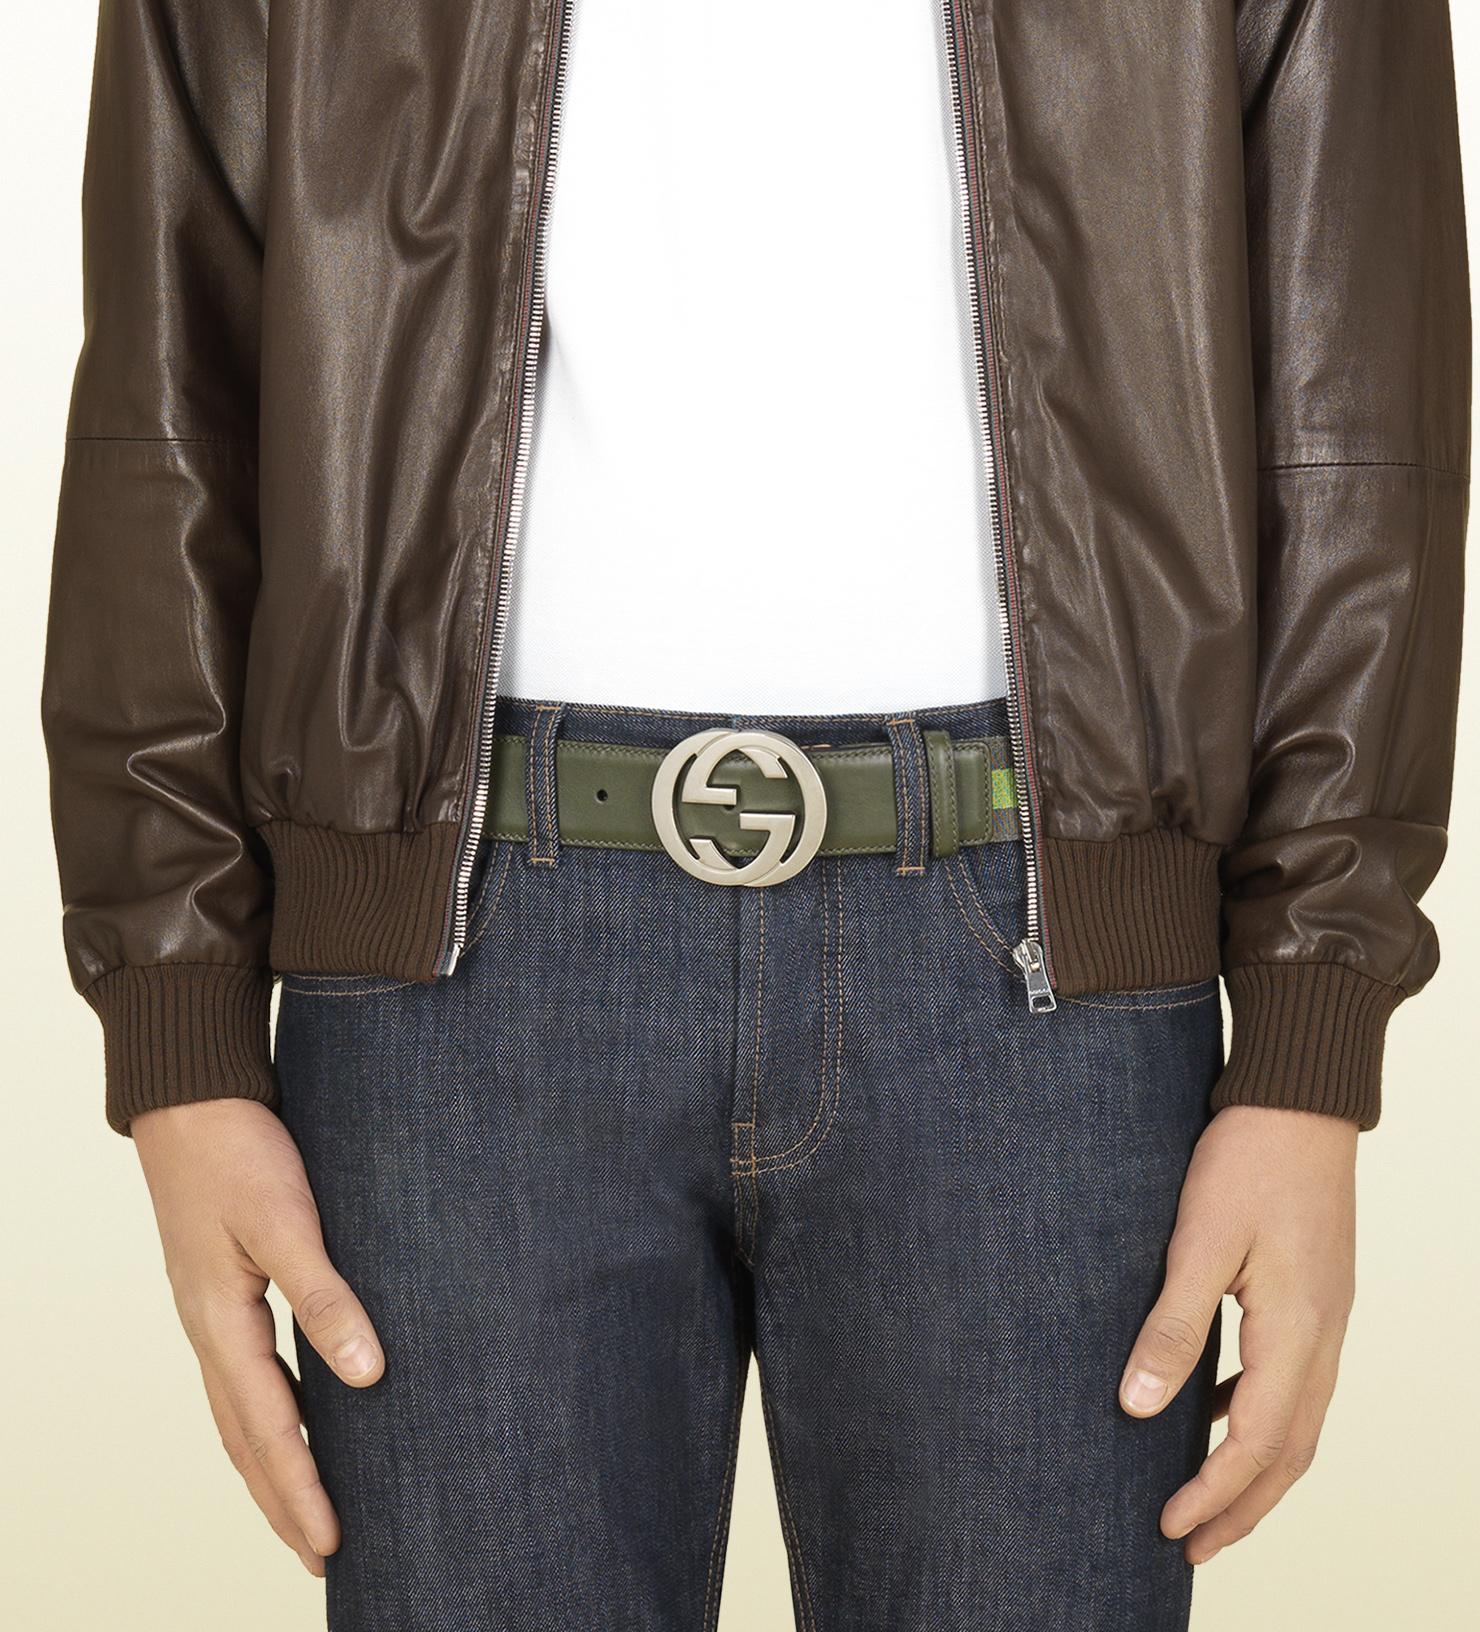 1da730ee59f Gucci Nylon Web Belt with Interlocking G Buckle in Green for Men - Lyst